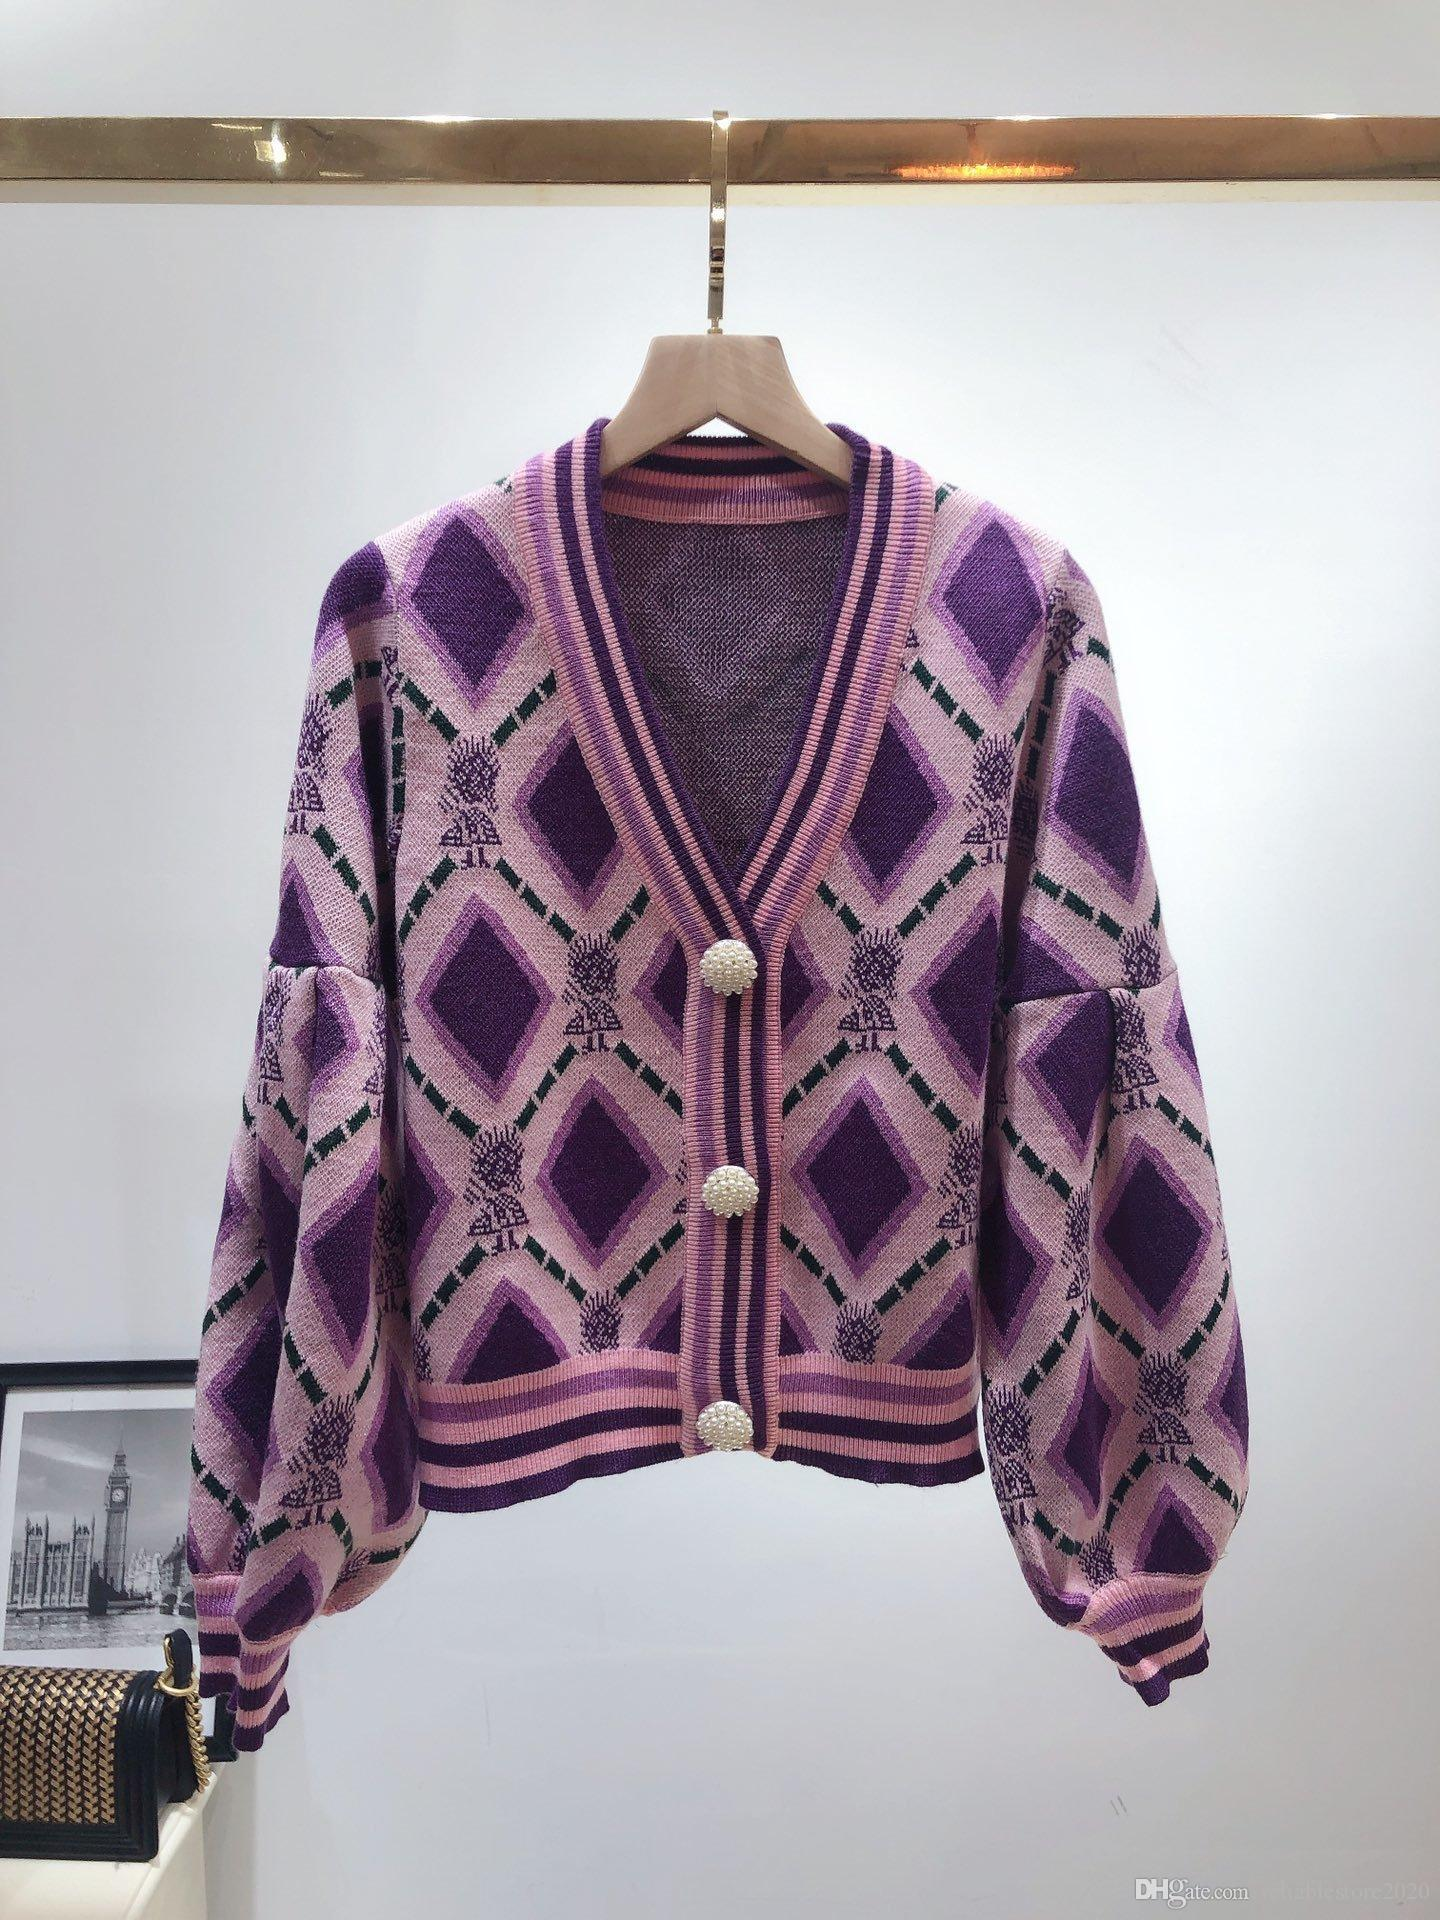 2020 Autumn winter Europe goods new sweater cardigan western style jacket V-neck wear long-sleeved fashionable flower sweater